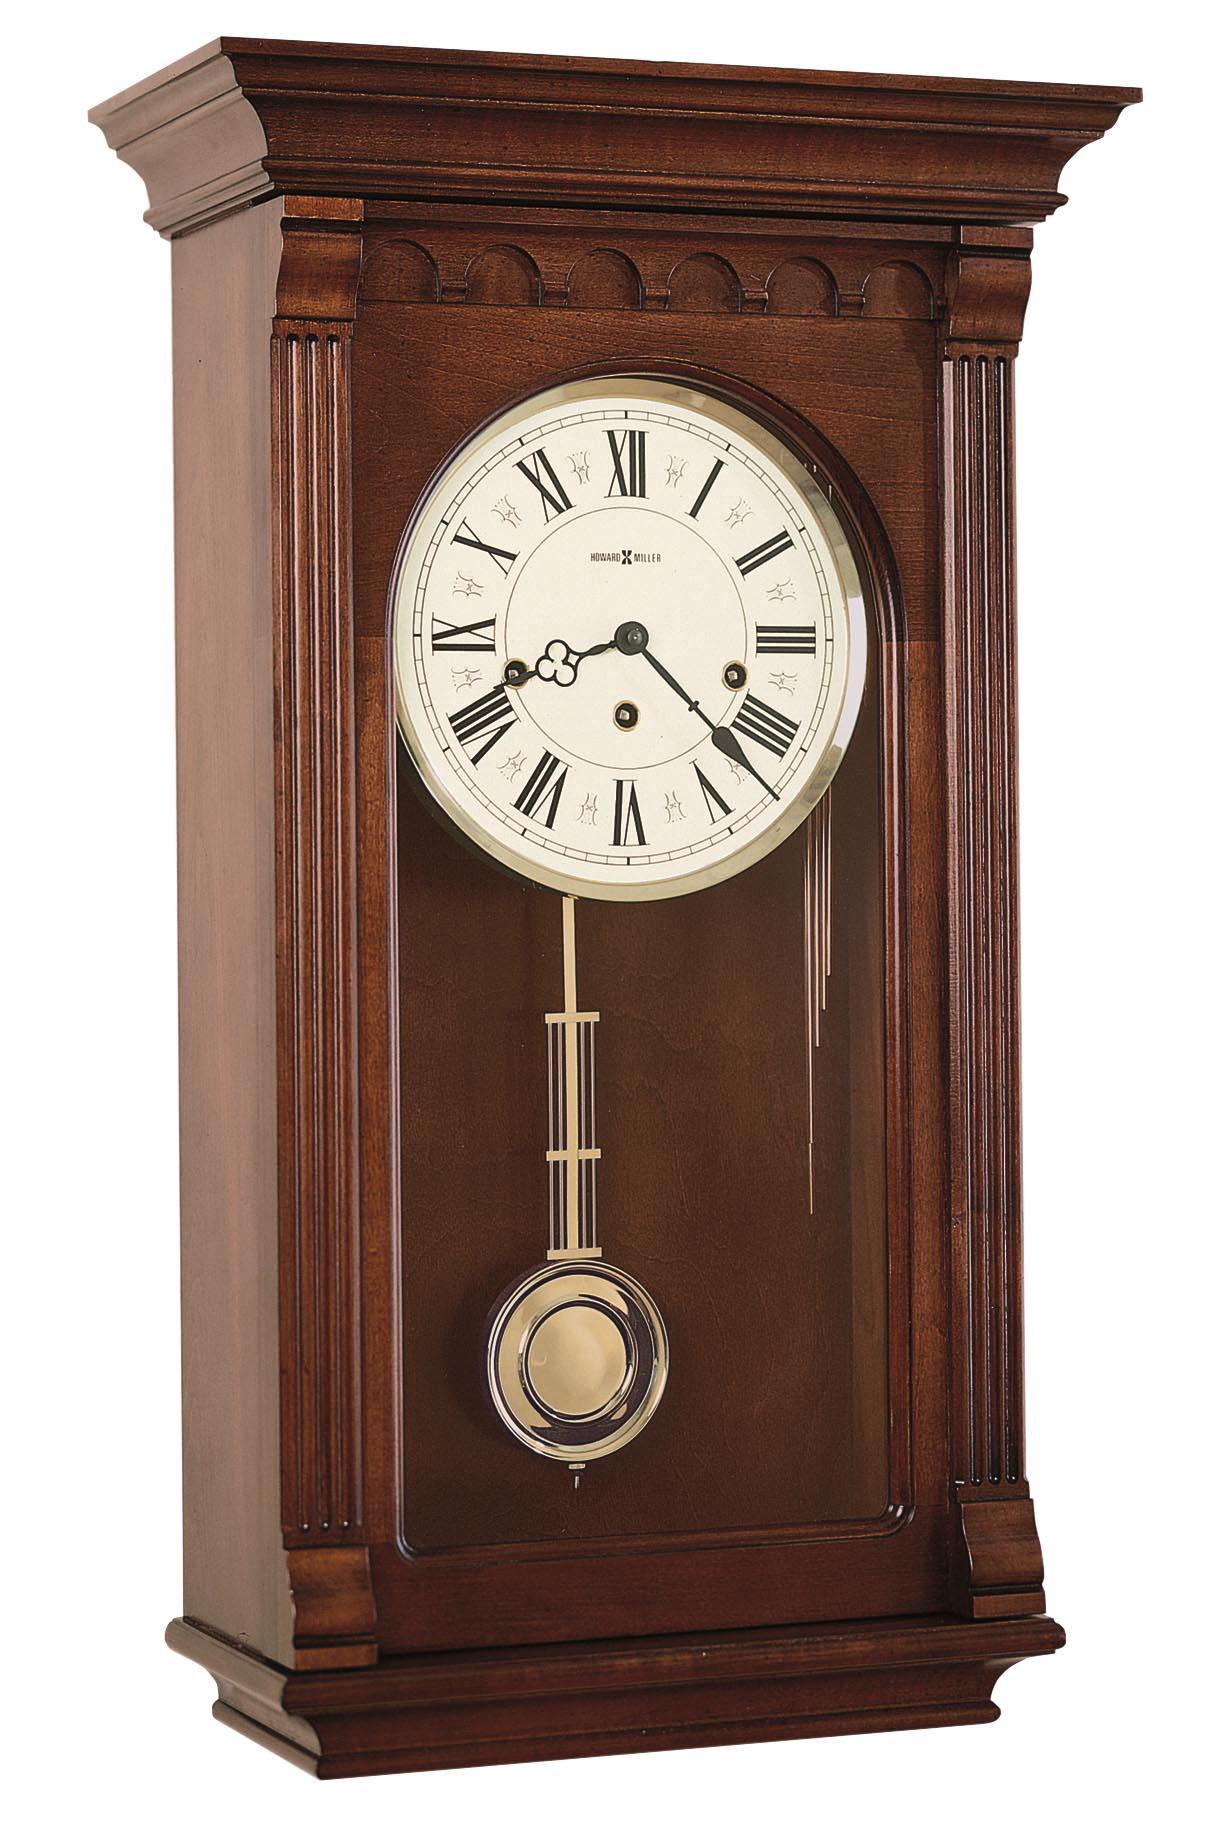 Howard miller wall clock grandfathers clock gallery clinic howard miller wall clock amipublicfo Images